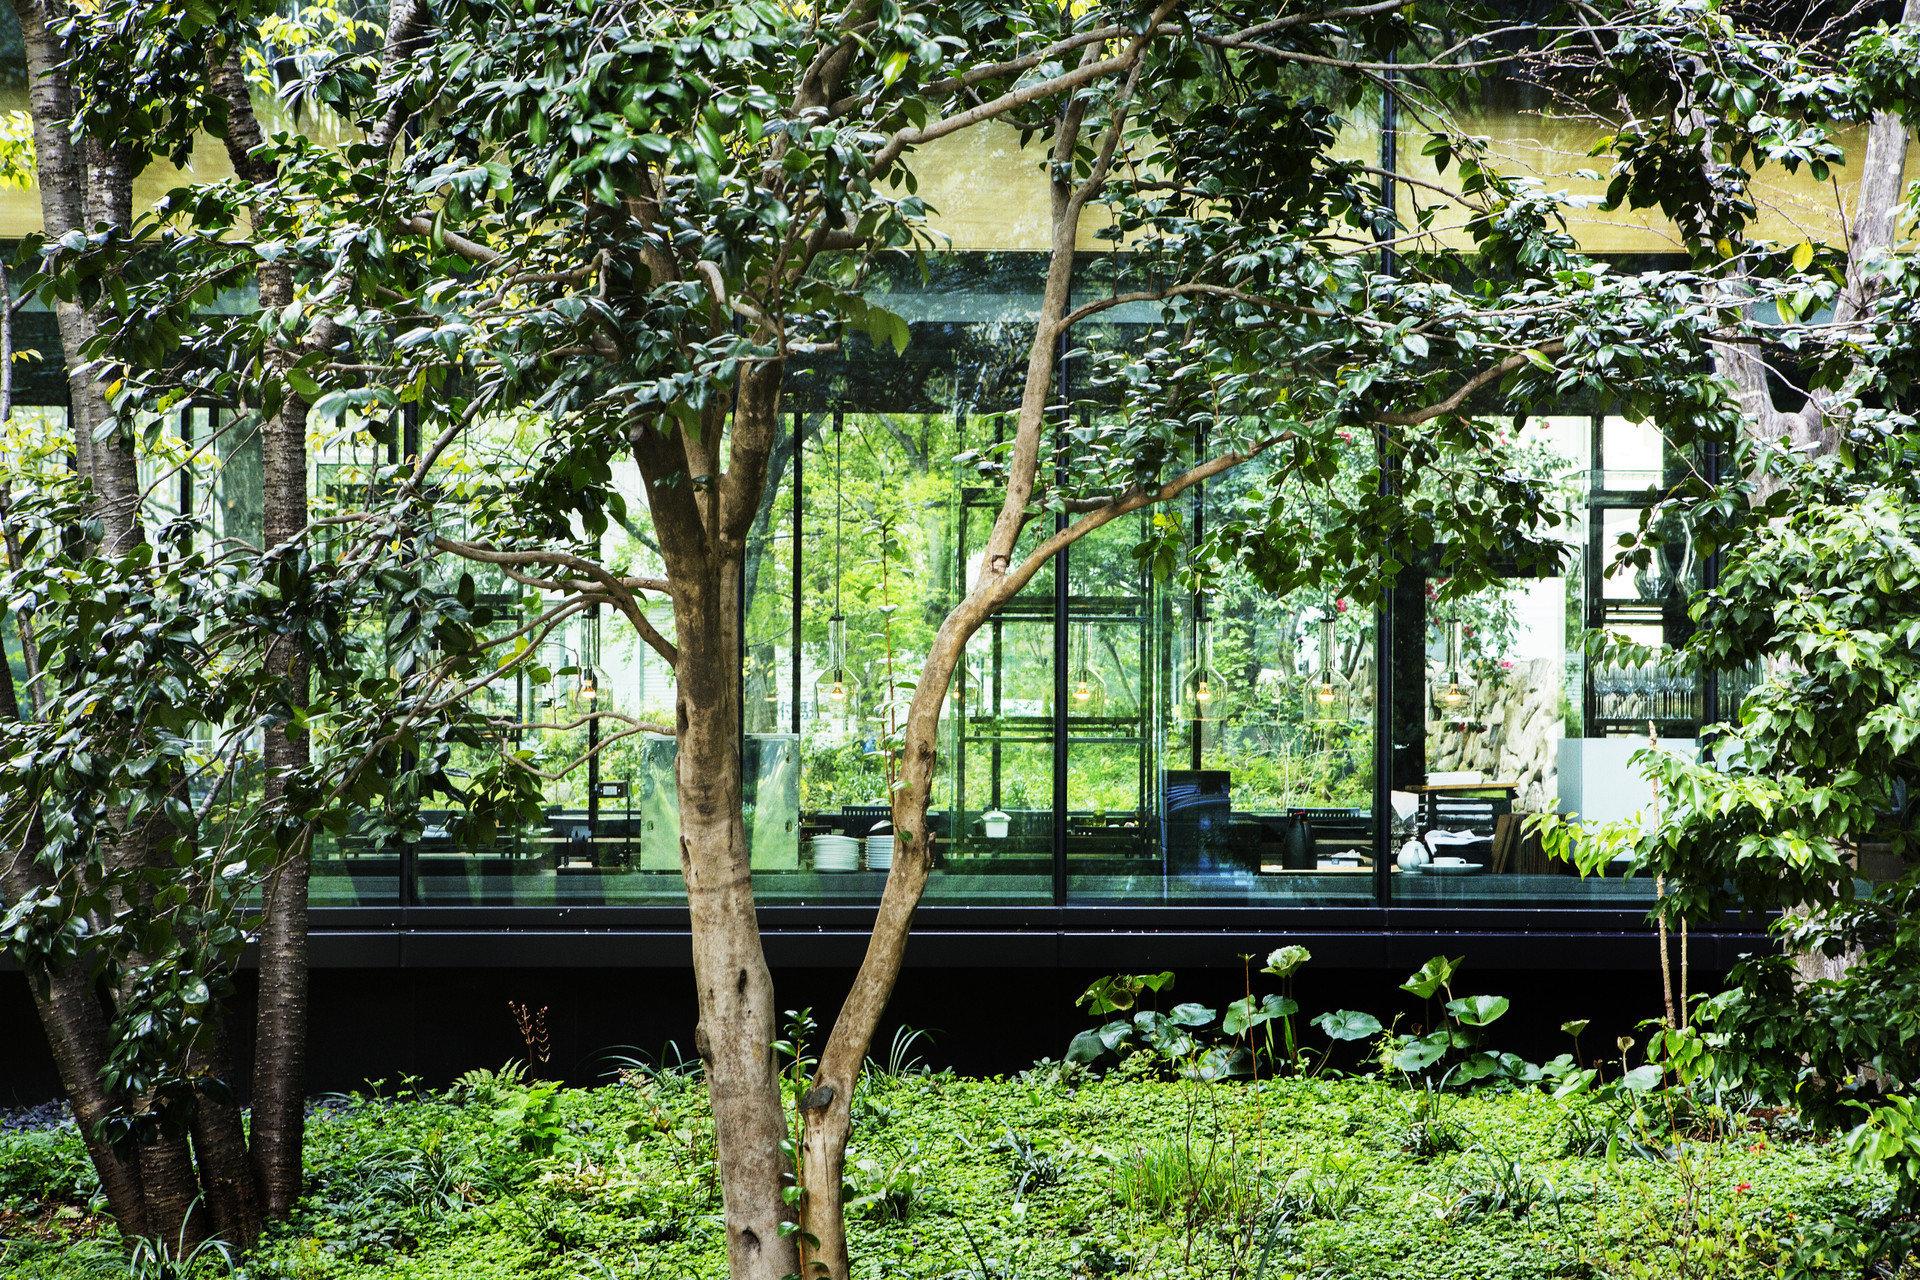 Hotels Japan Tokyo tree outdoor park flora botany Garden plant house flower woody plant woodland estate backyard Jungle yard cottage botanical garden outdoor structure area wooded